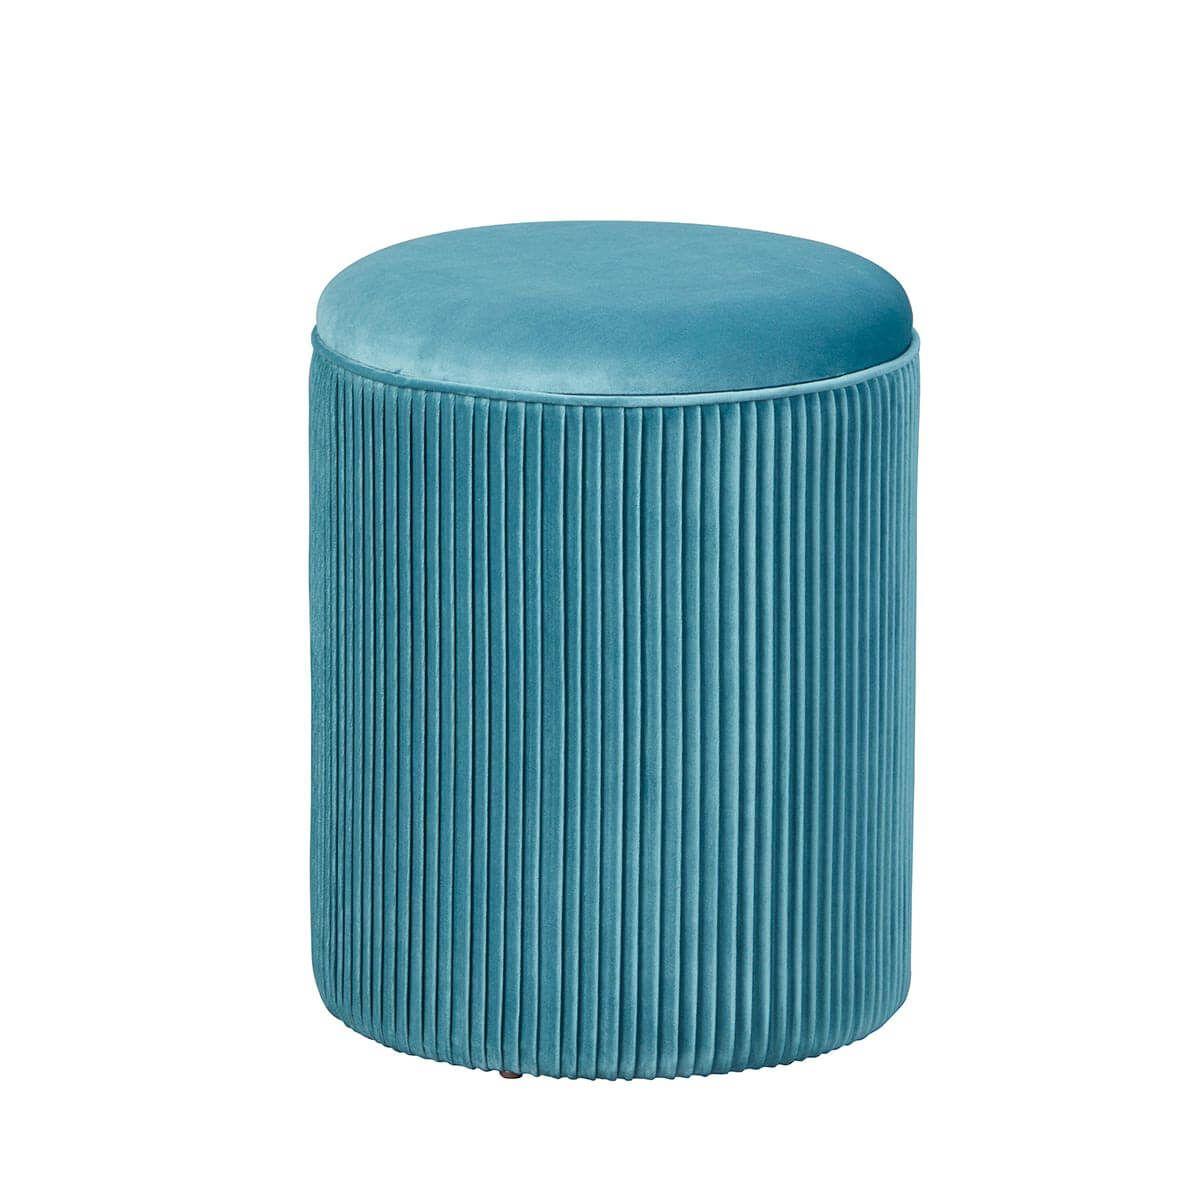 Pouf avec Coffre de Rangement Bleu